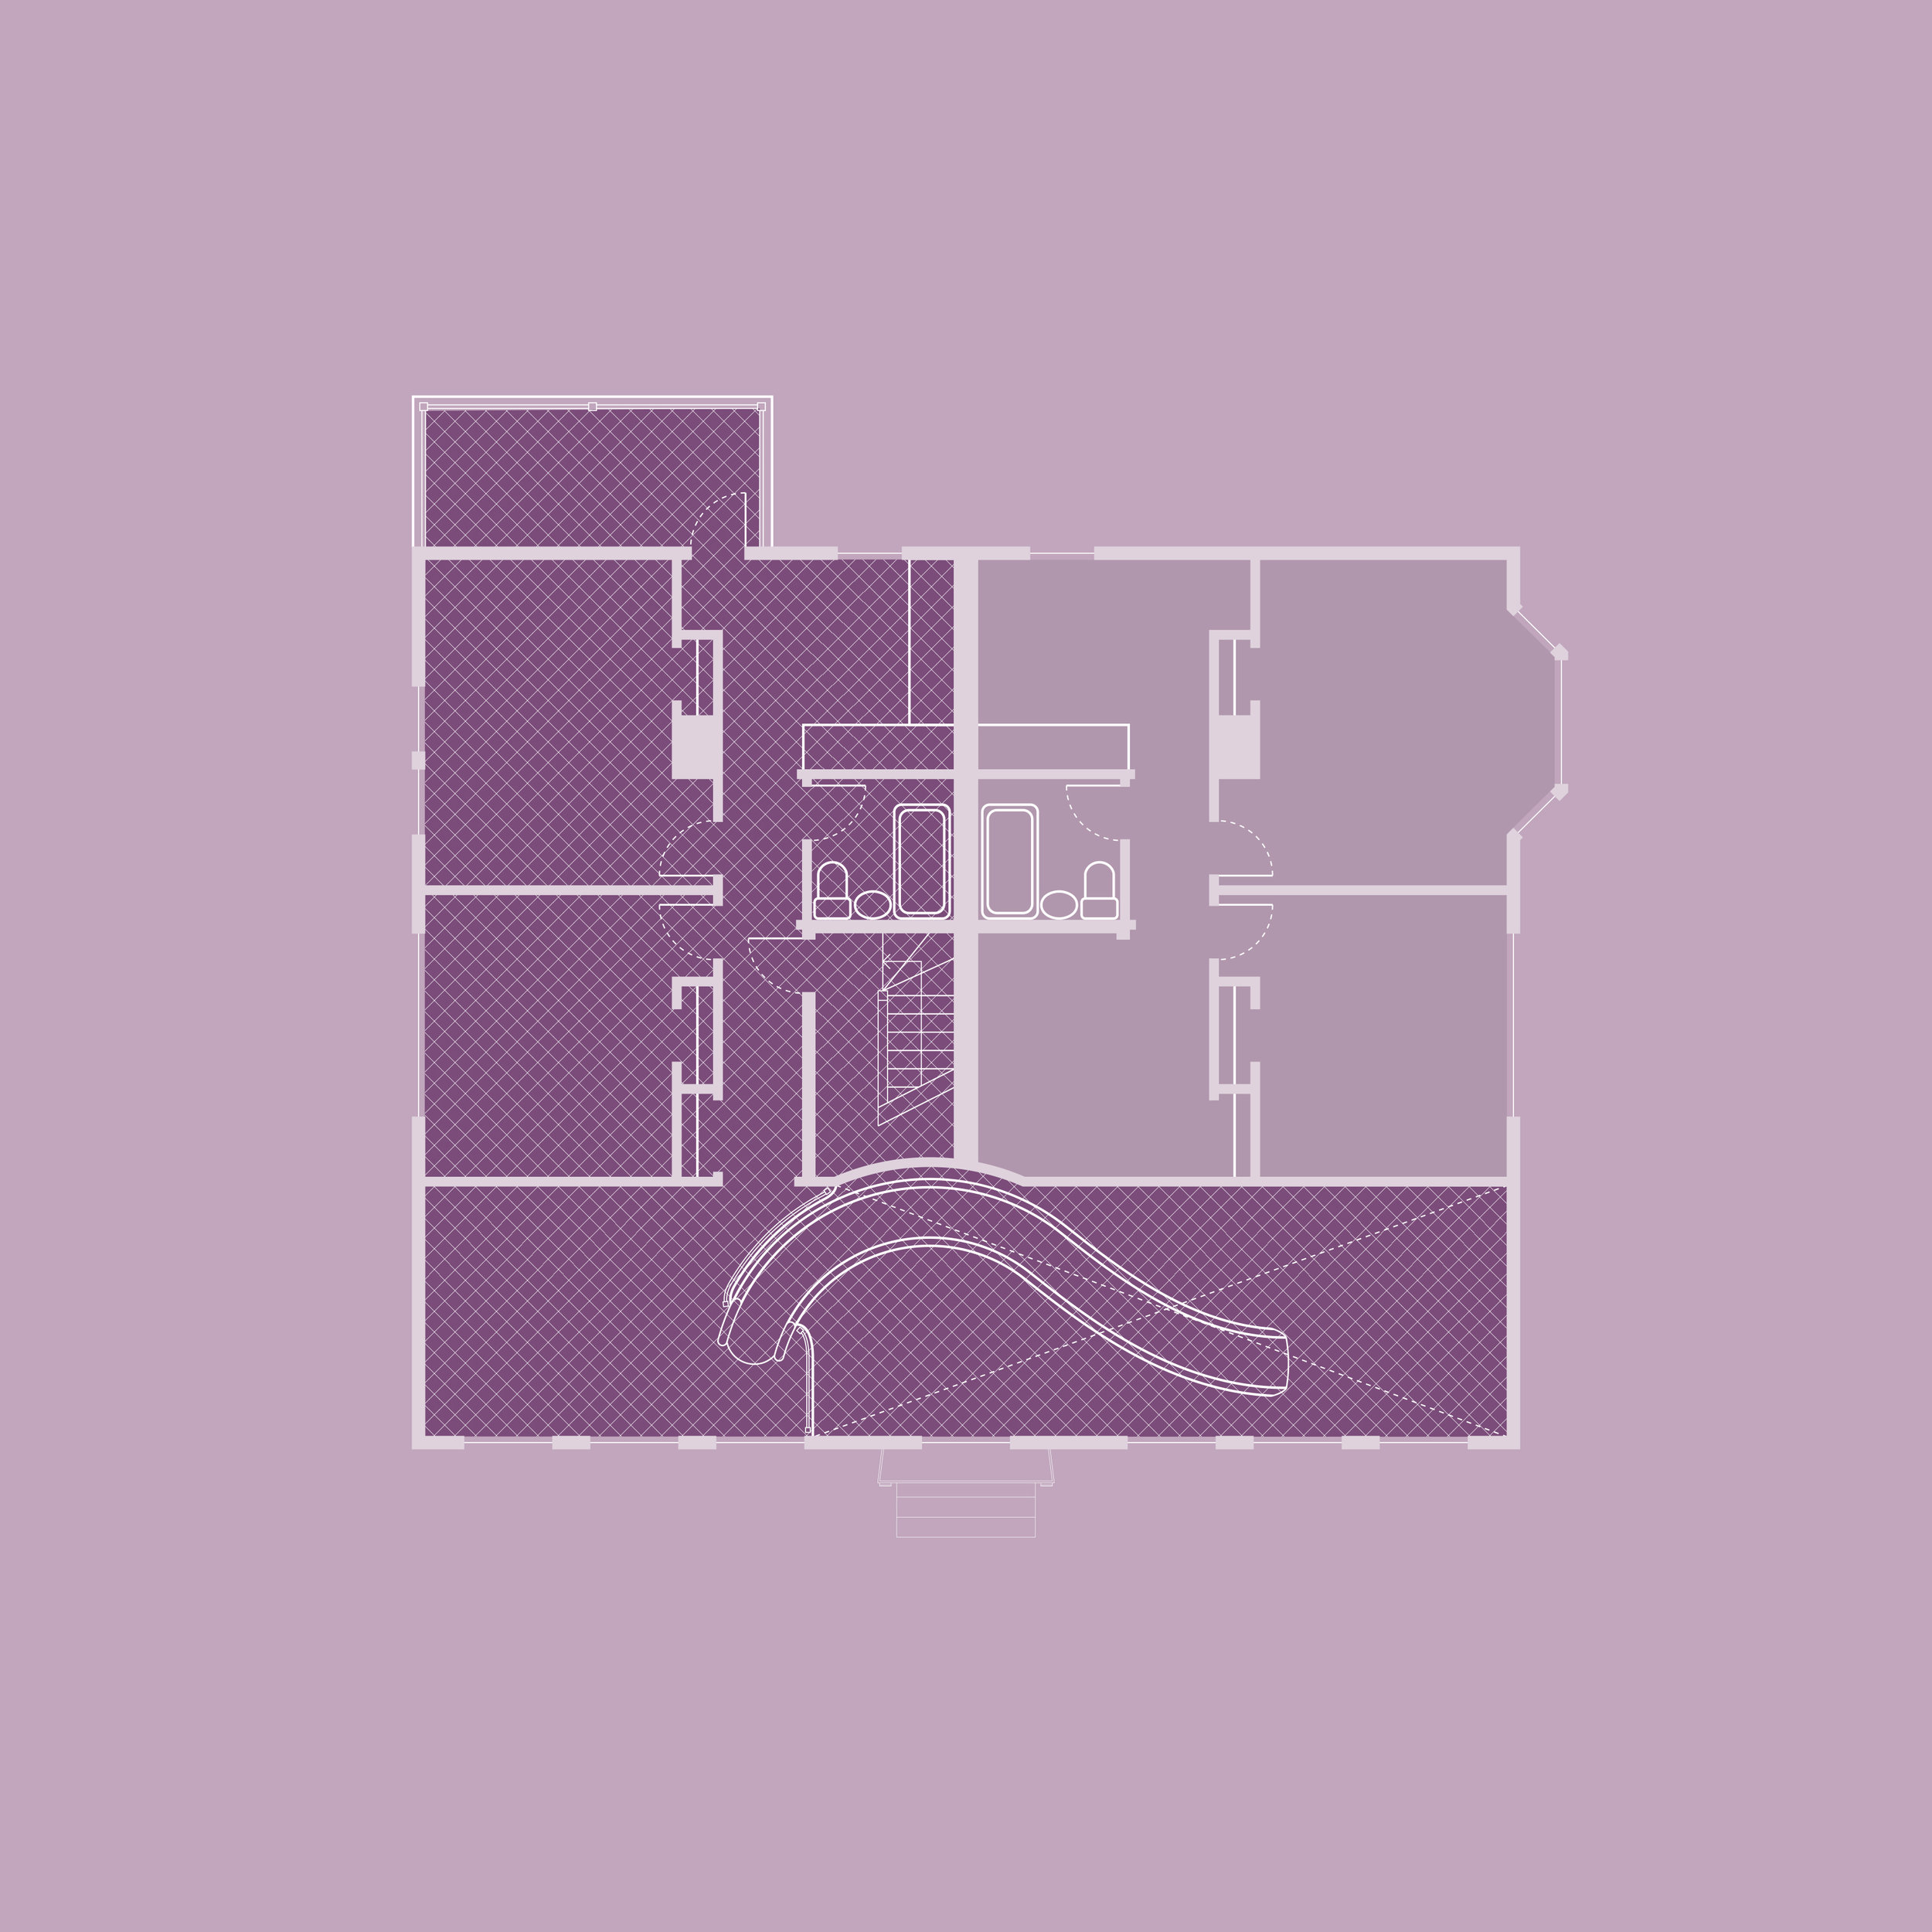 TripleDecker_Wormhole_Plans-3.jpg